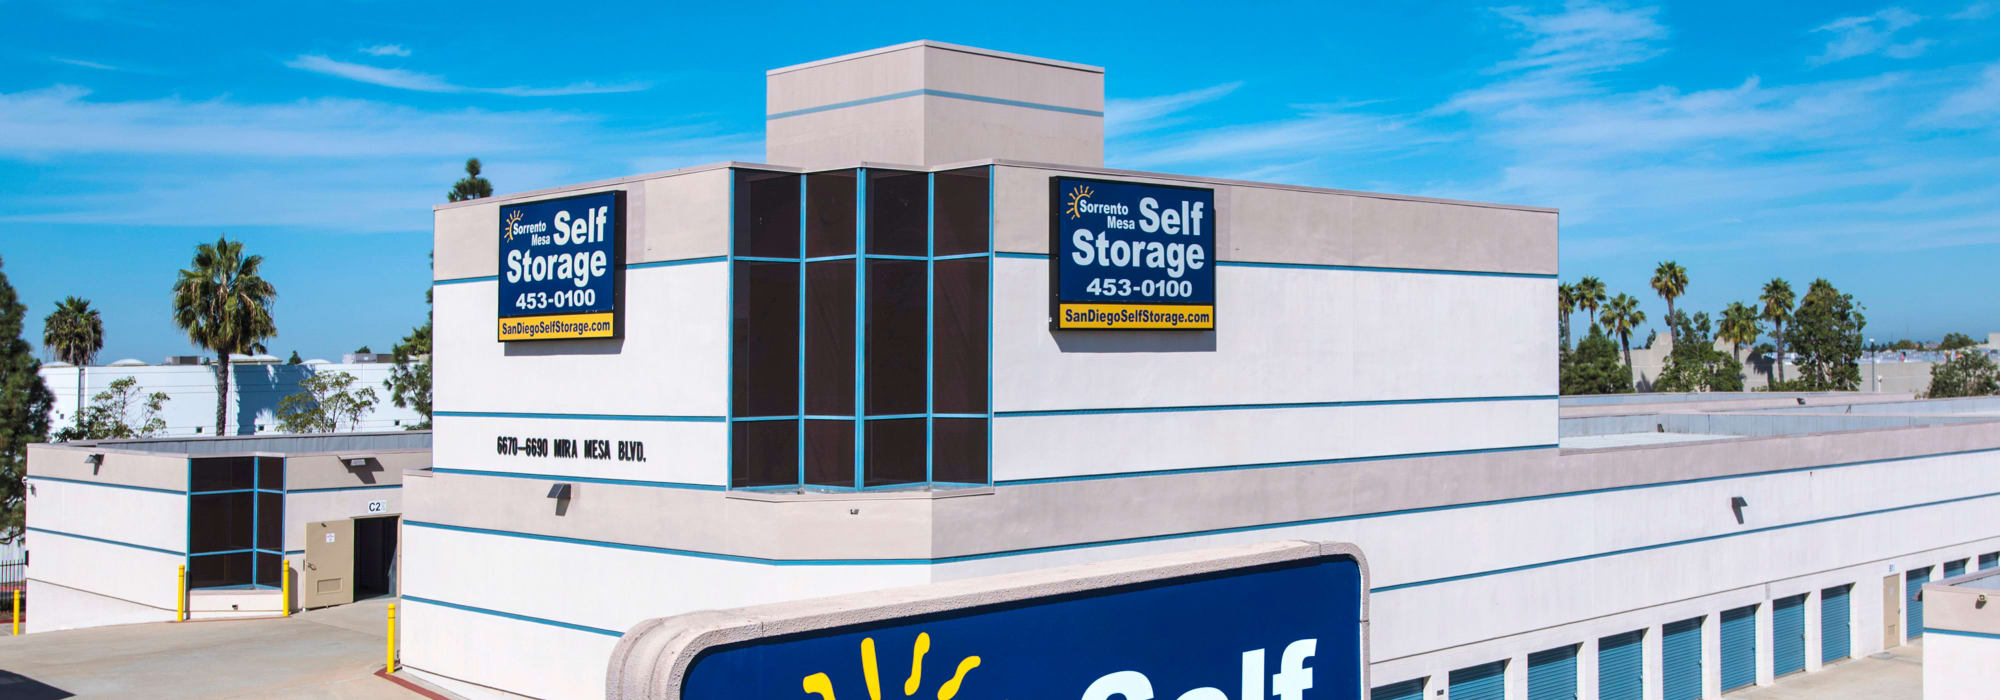 Branding on the exterior of Sorrento Mesa Self Storage in San Diego, California